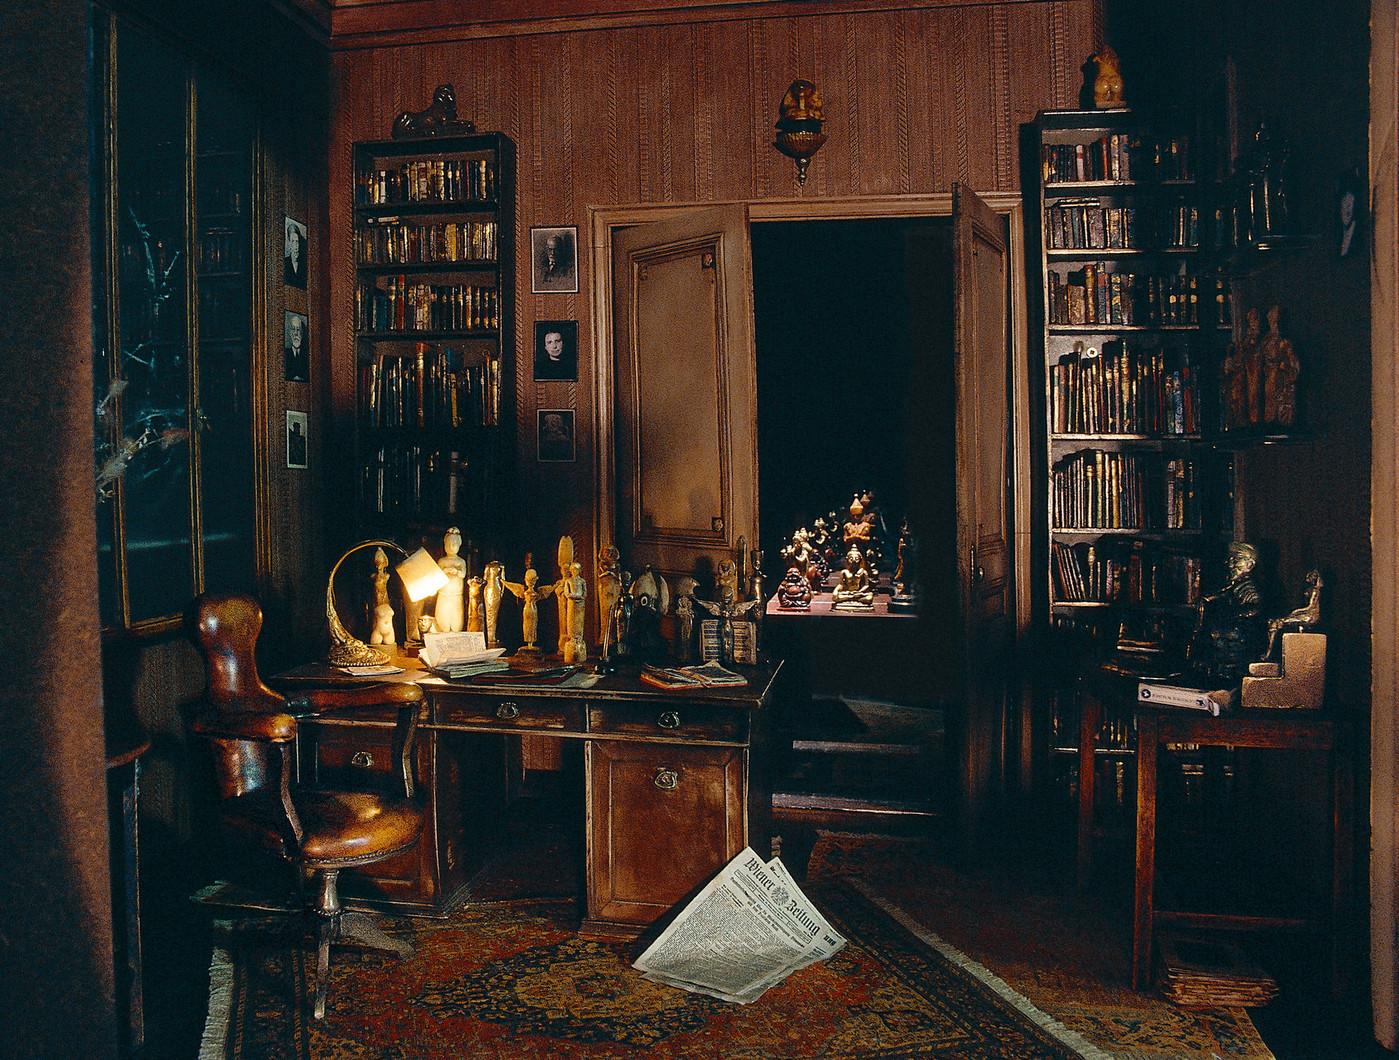 Cabinet-Sigmund-Freud-reproduit-miniature-lartiste-Charles-Matton-2002_0_1399_1060